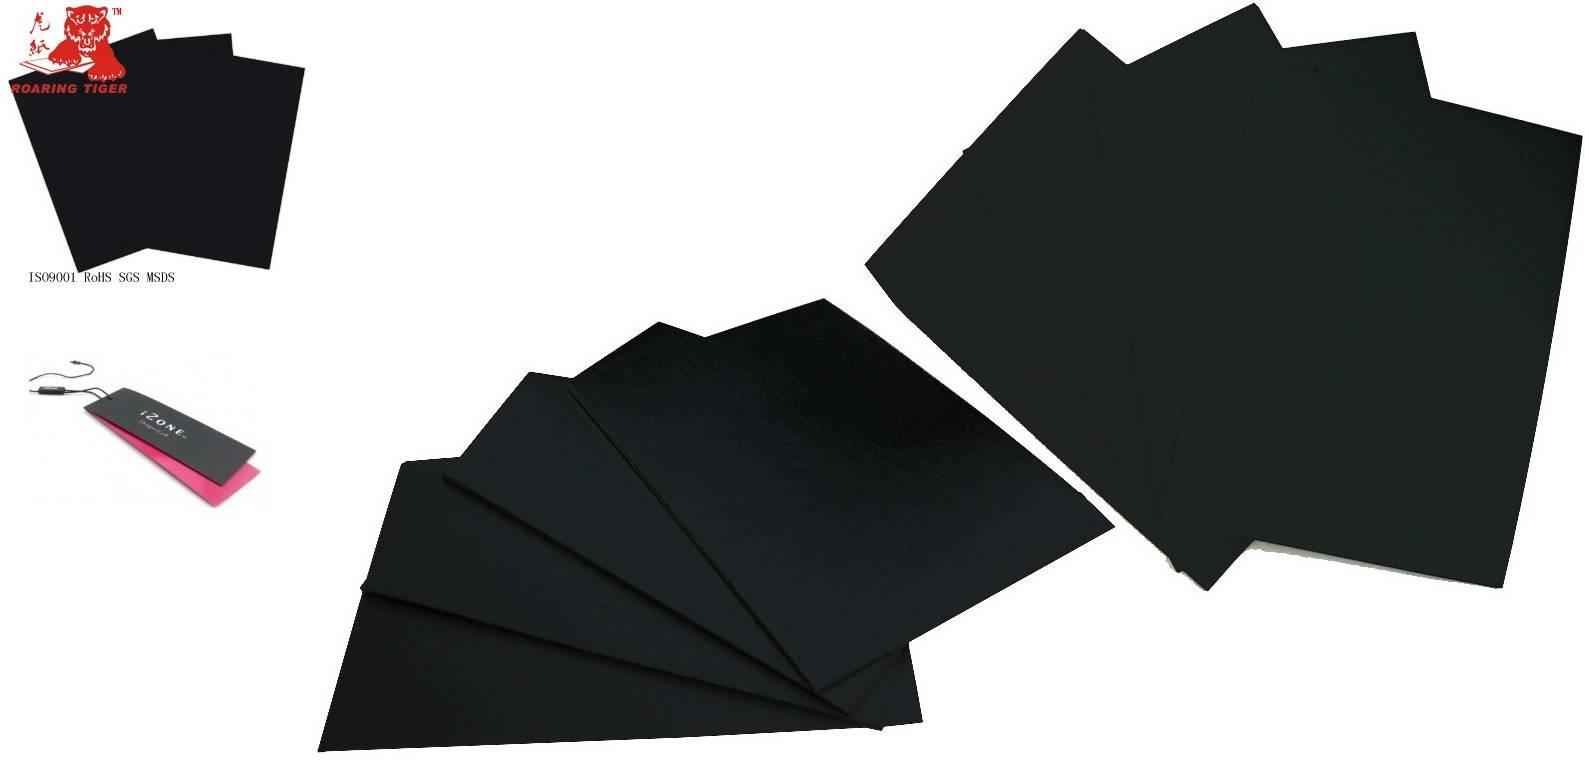 Black paper board/laminated cardboard/paperboard 370g 380g 390g 400g 410g 420g 430g 440g 450g 460g 4